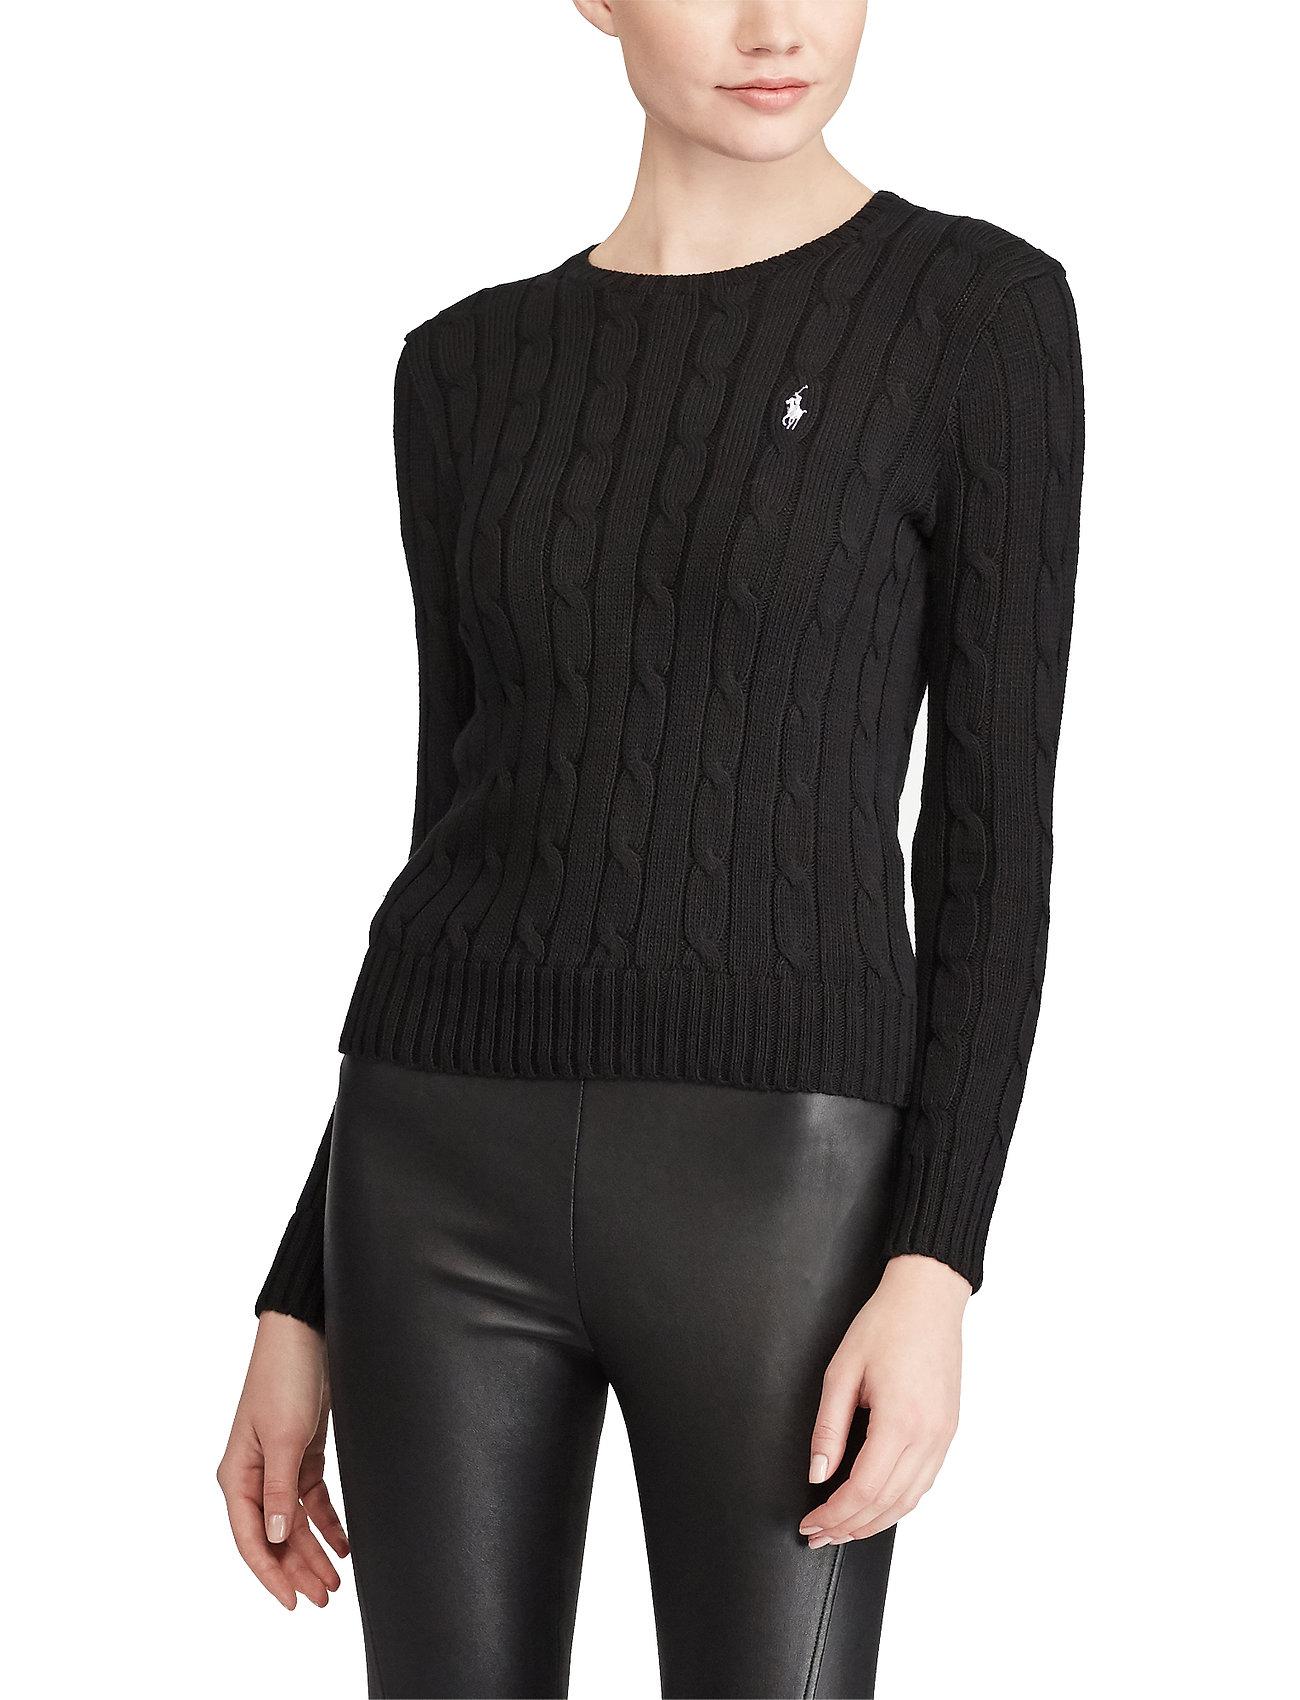 Polo Ralph Lauren - Cable-Knit Cotton Sweater - trøjer - polo black/white - 0